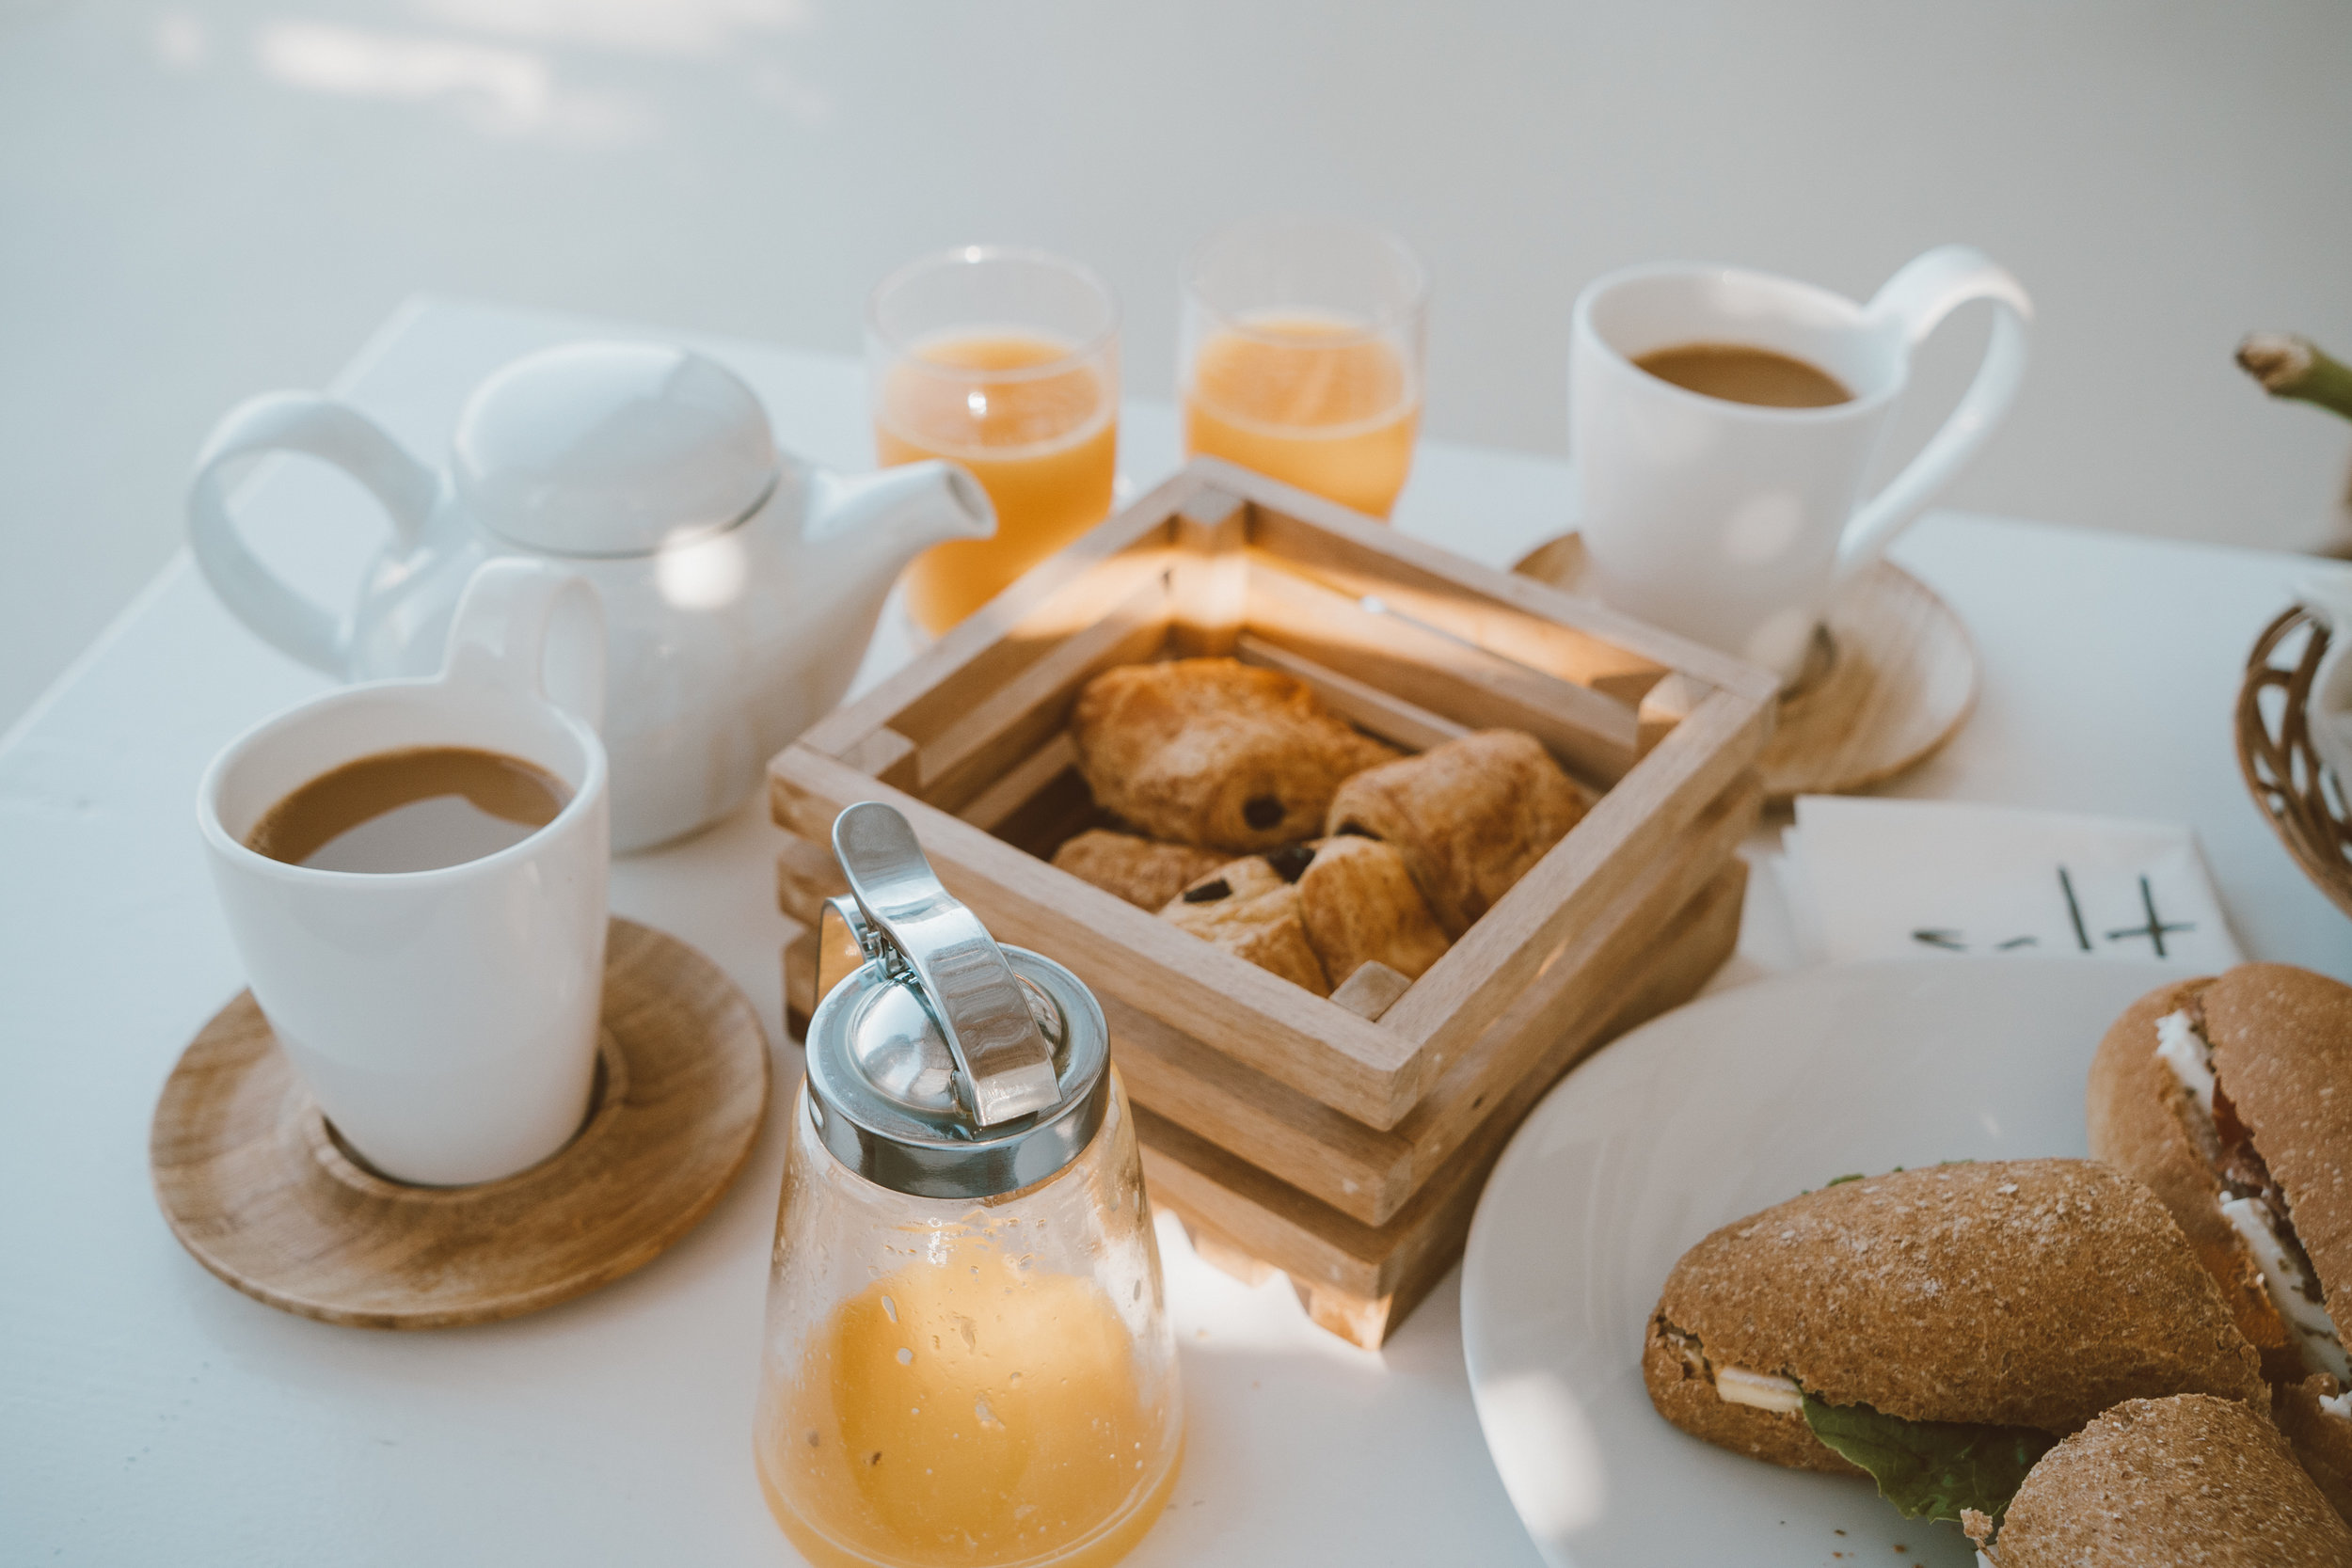 Salt Milos Breakfast Review - illumelation